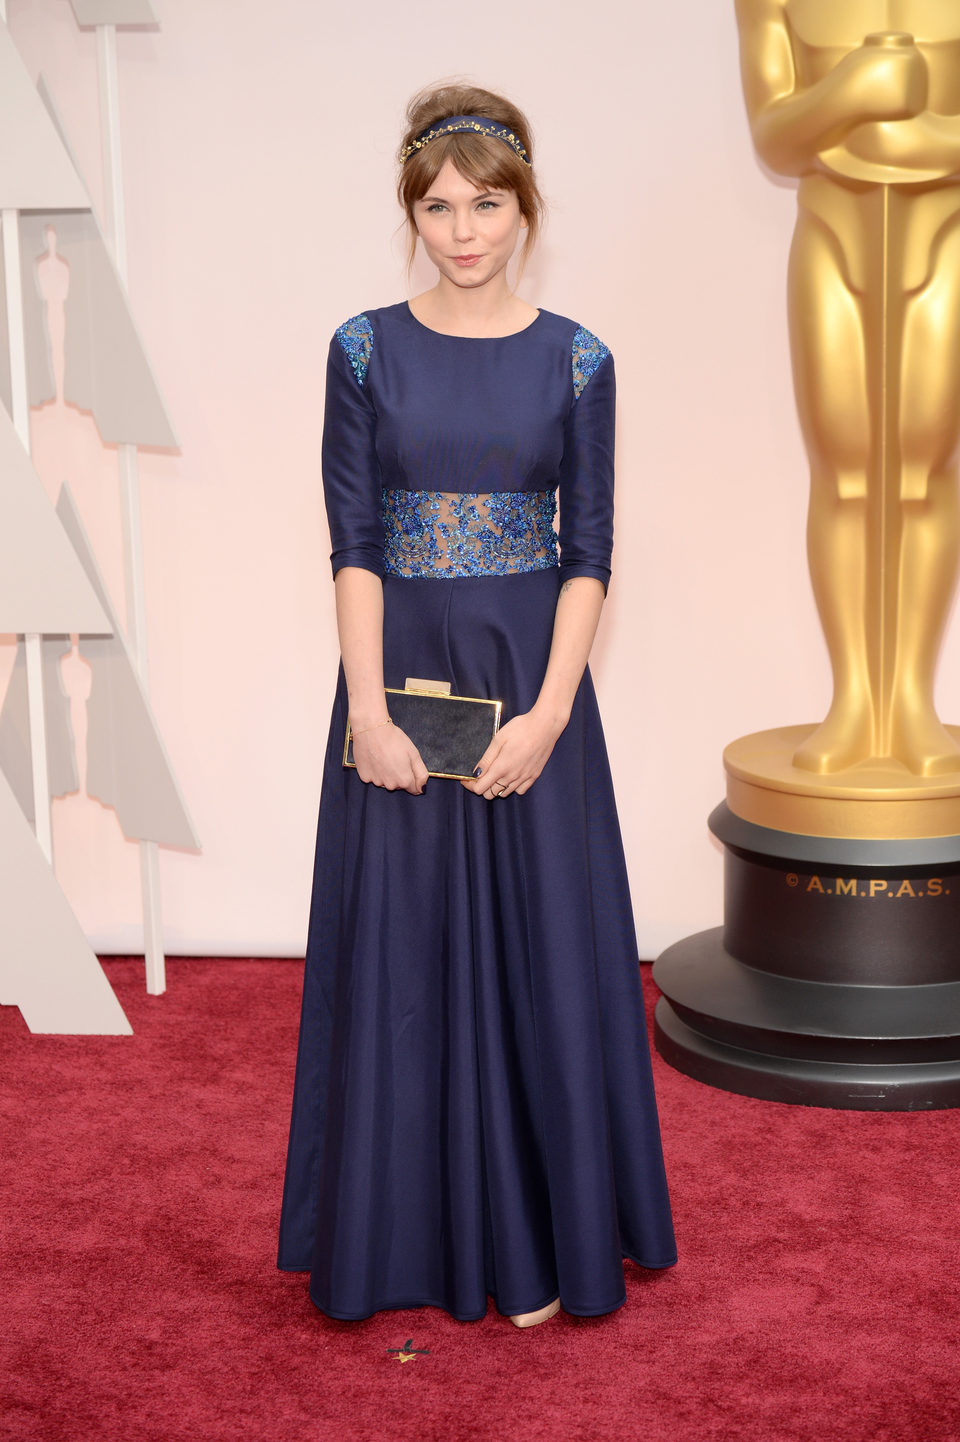 Agata Trzebuchowska at the Oscars Awards 2015 red carpet